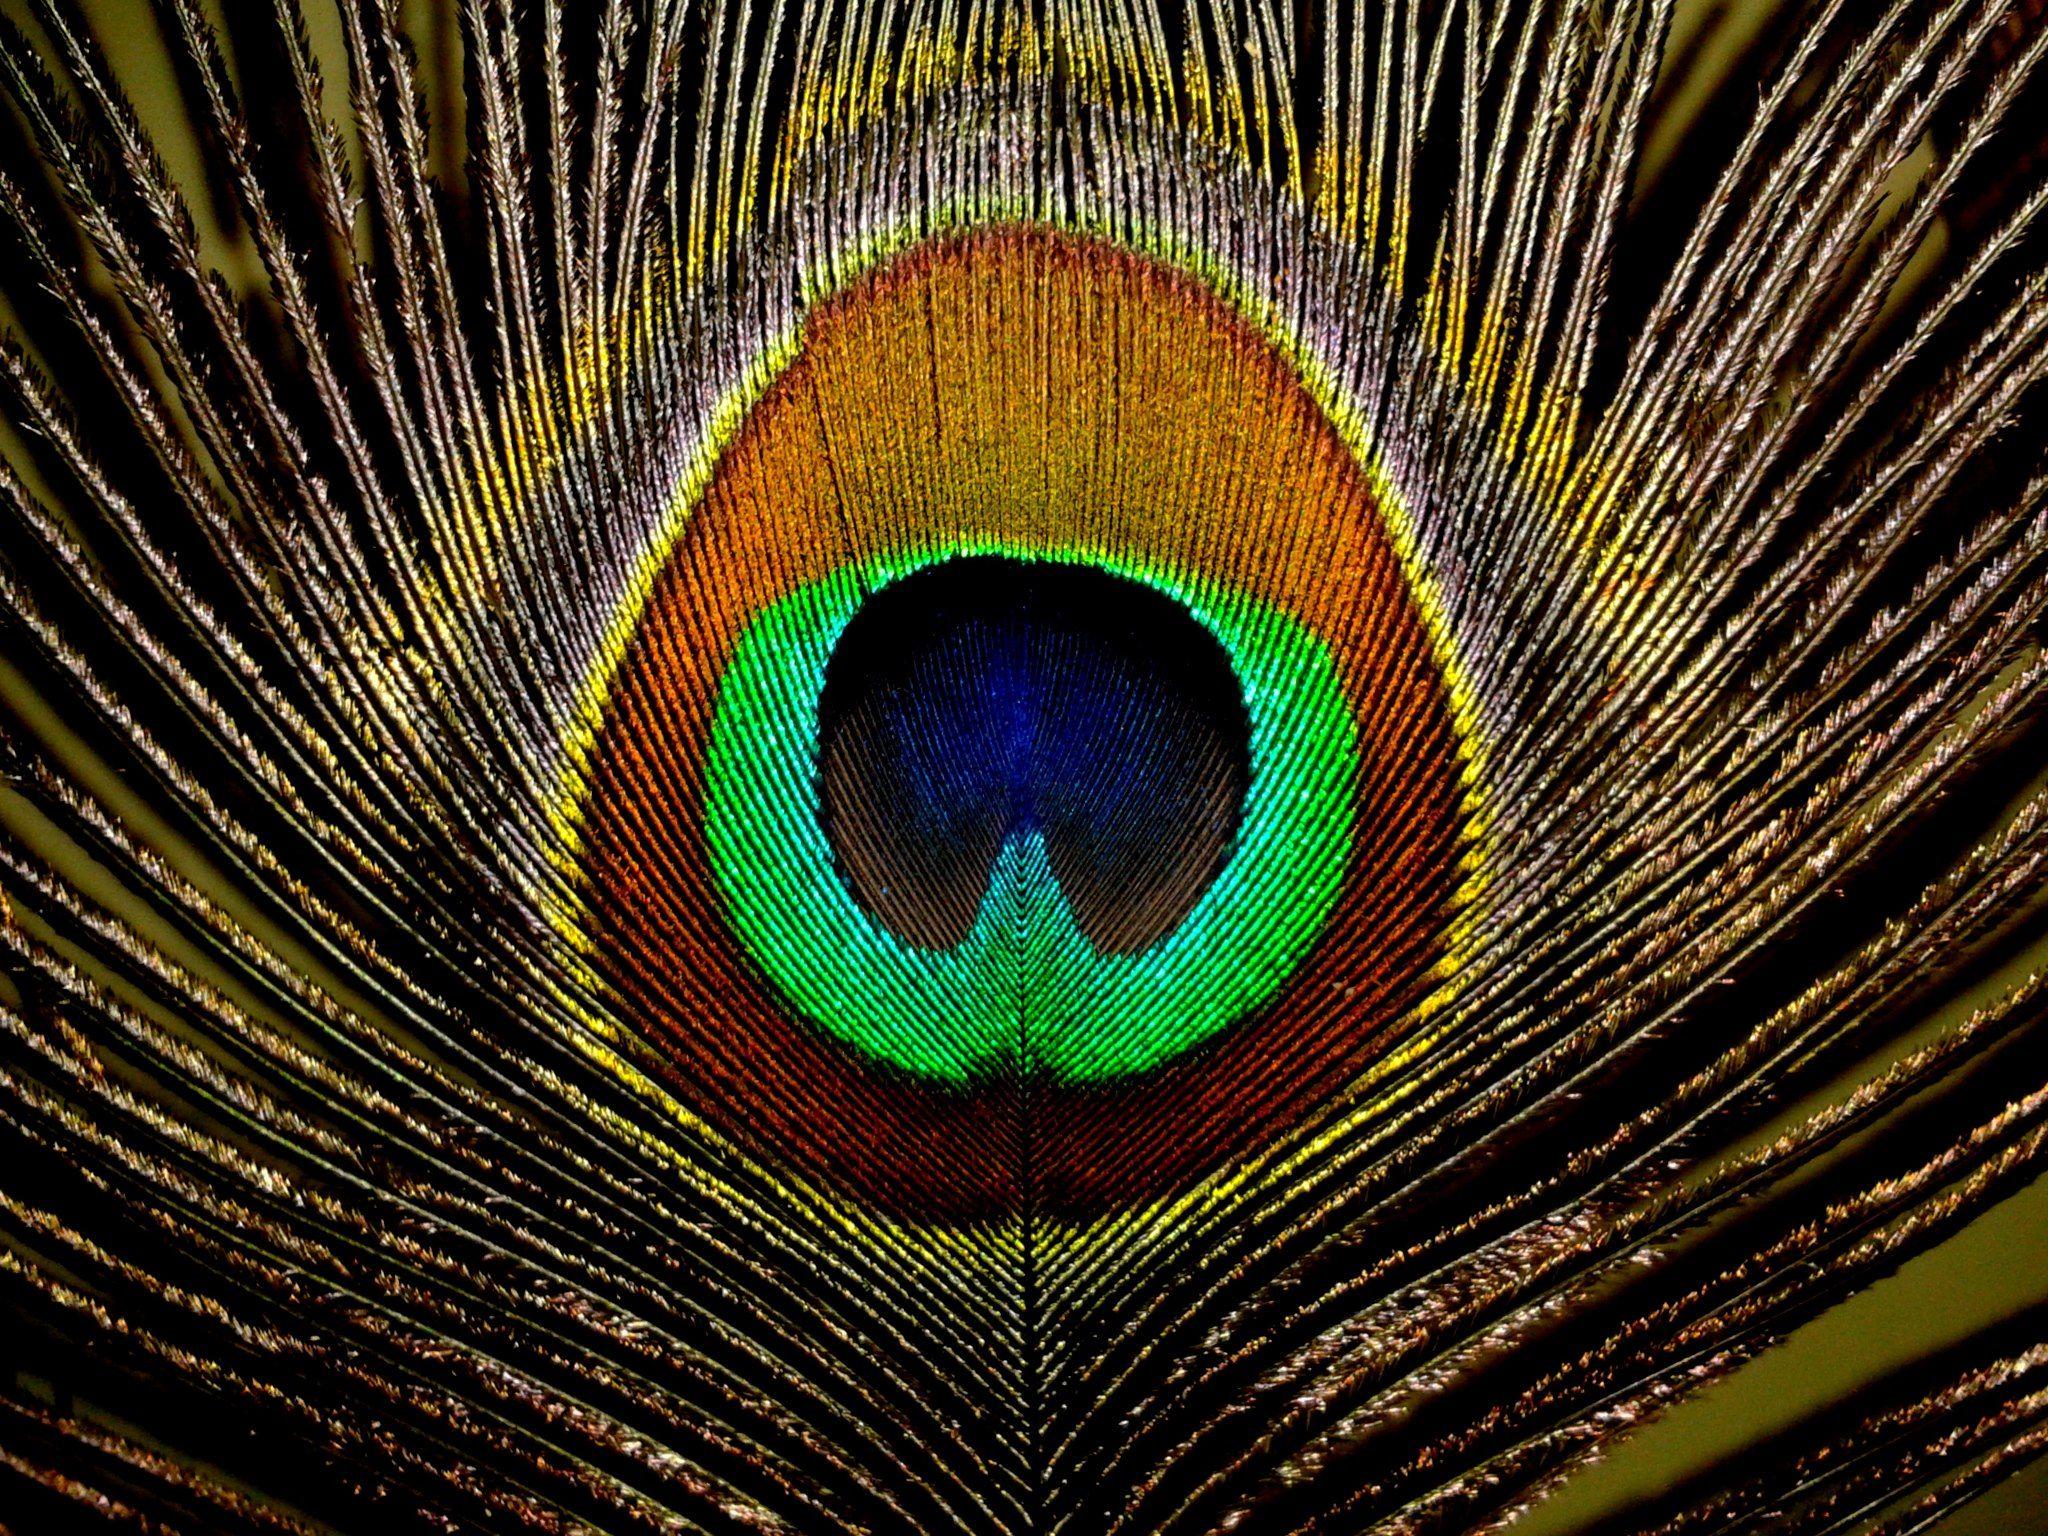 rainbow feathers wallpaper 2048x1536